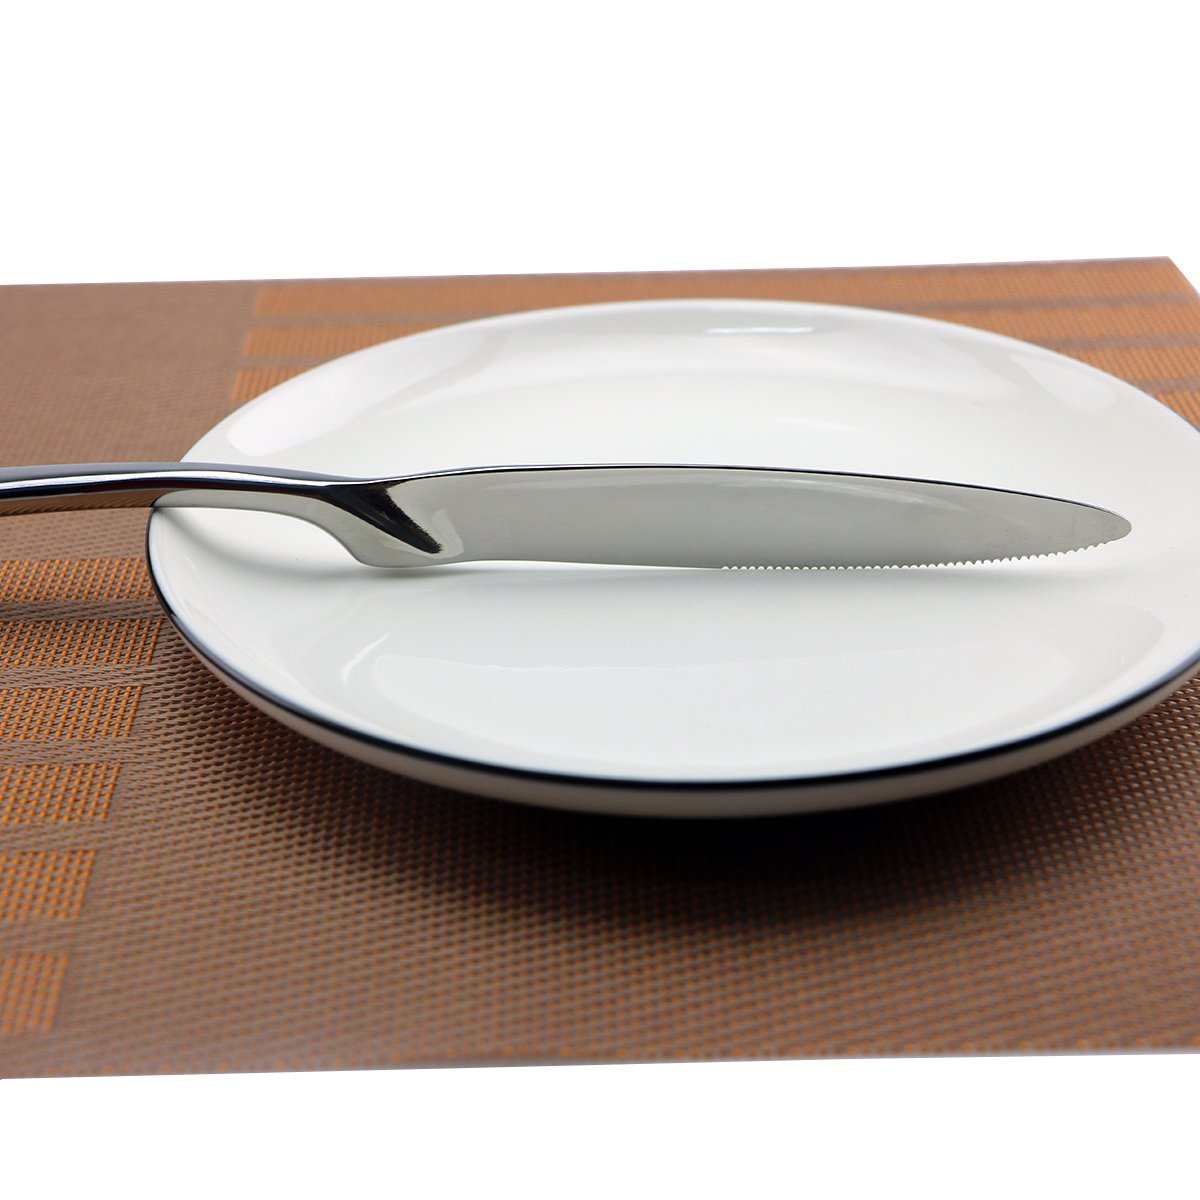 20-Piece New Western Tableware 304 Stainless Steel Dinnerware Knife Fork Spoon  sc 1 st  eBay & 20-Piece New Western Tableware 304 Stainless Steel Dinnerware Knife ...